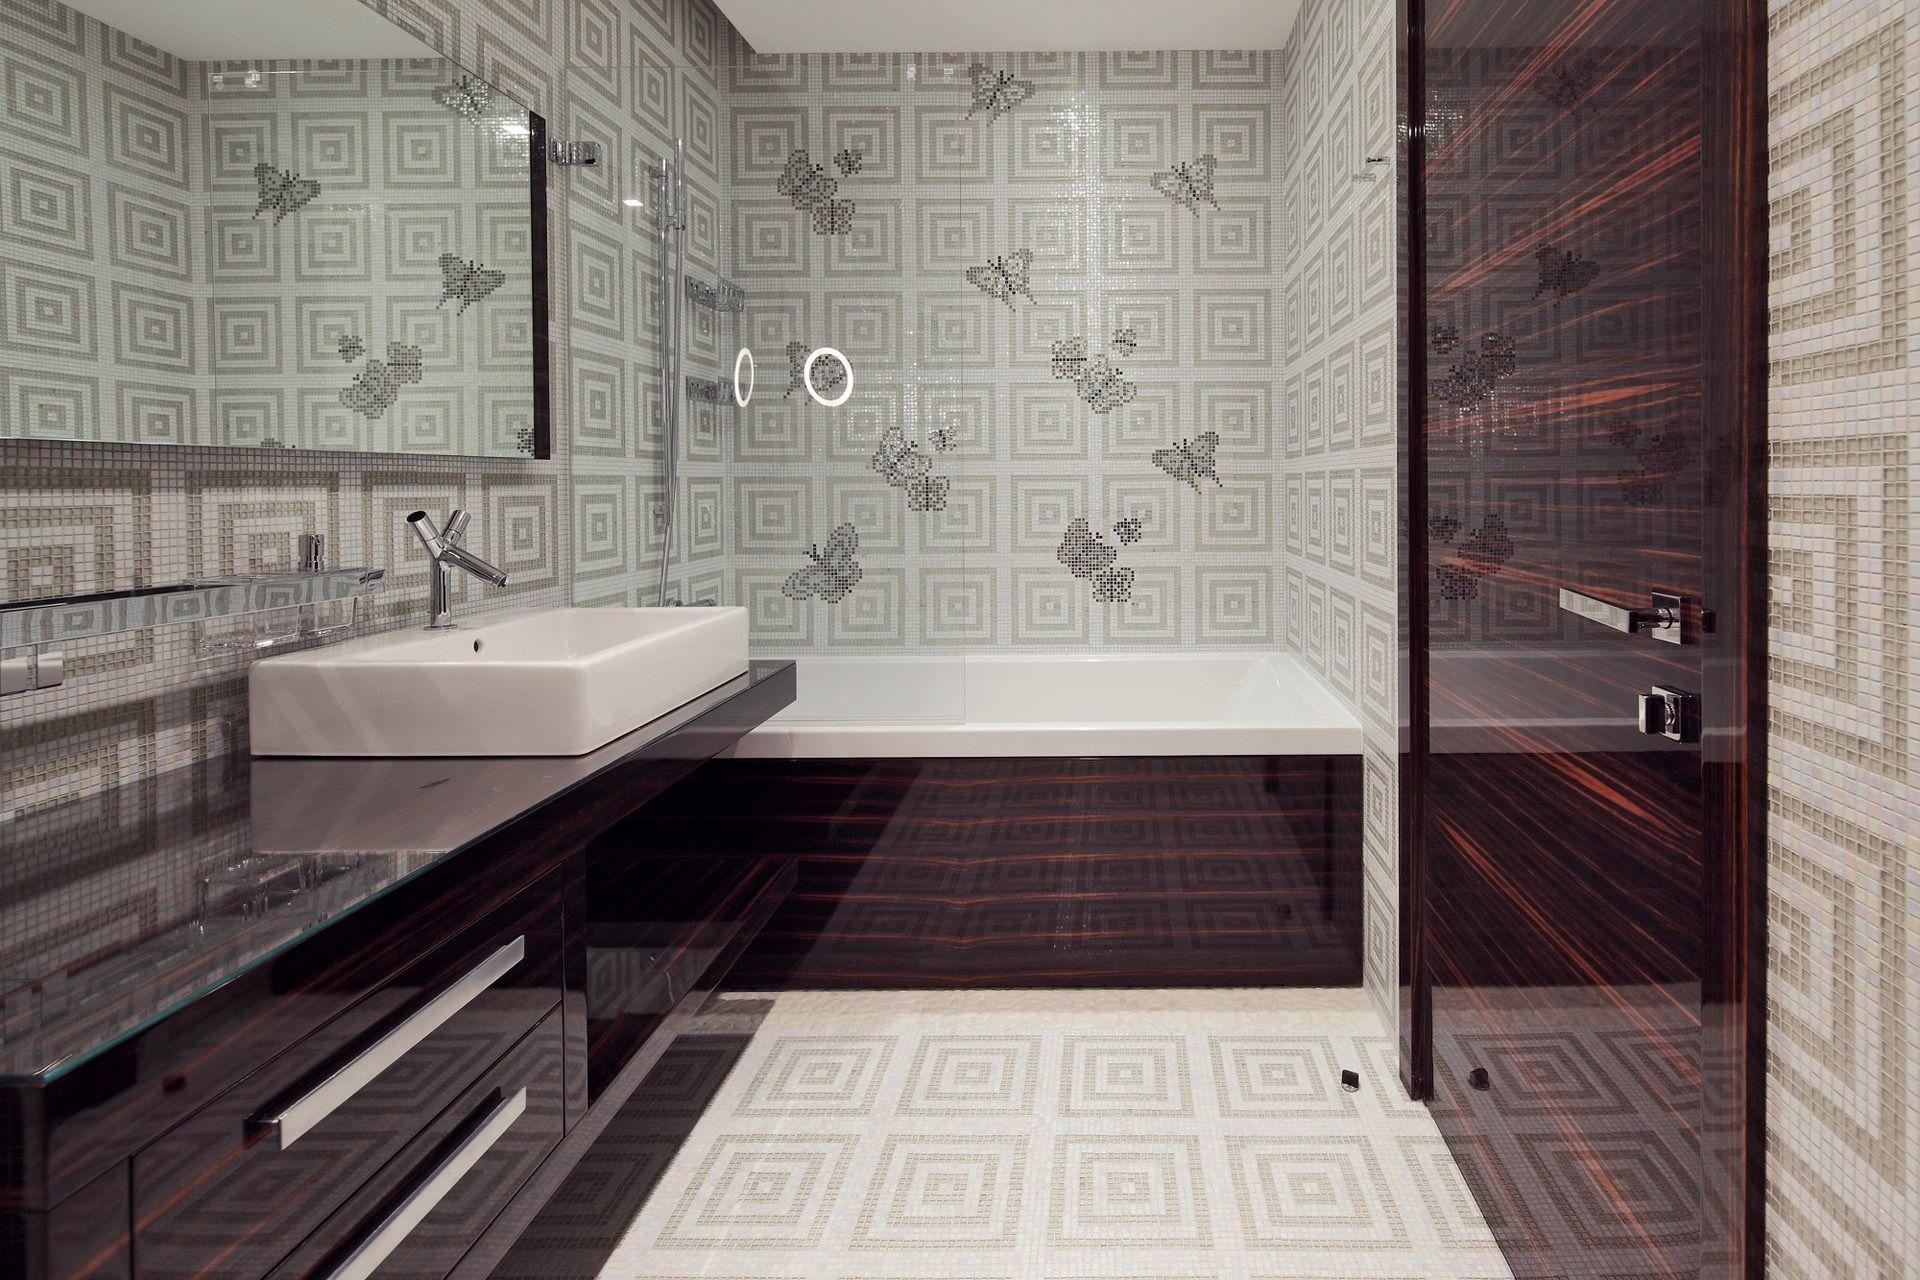 Badezimmer Tapeten Ideen Badezimmer Design Badezimmerfliesen